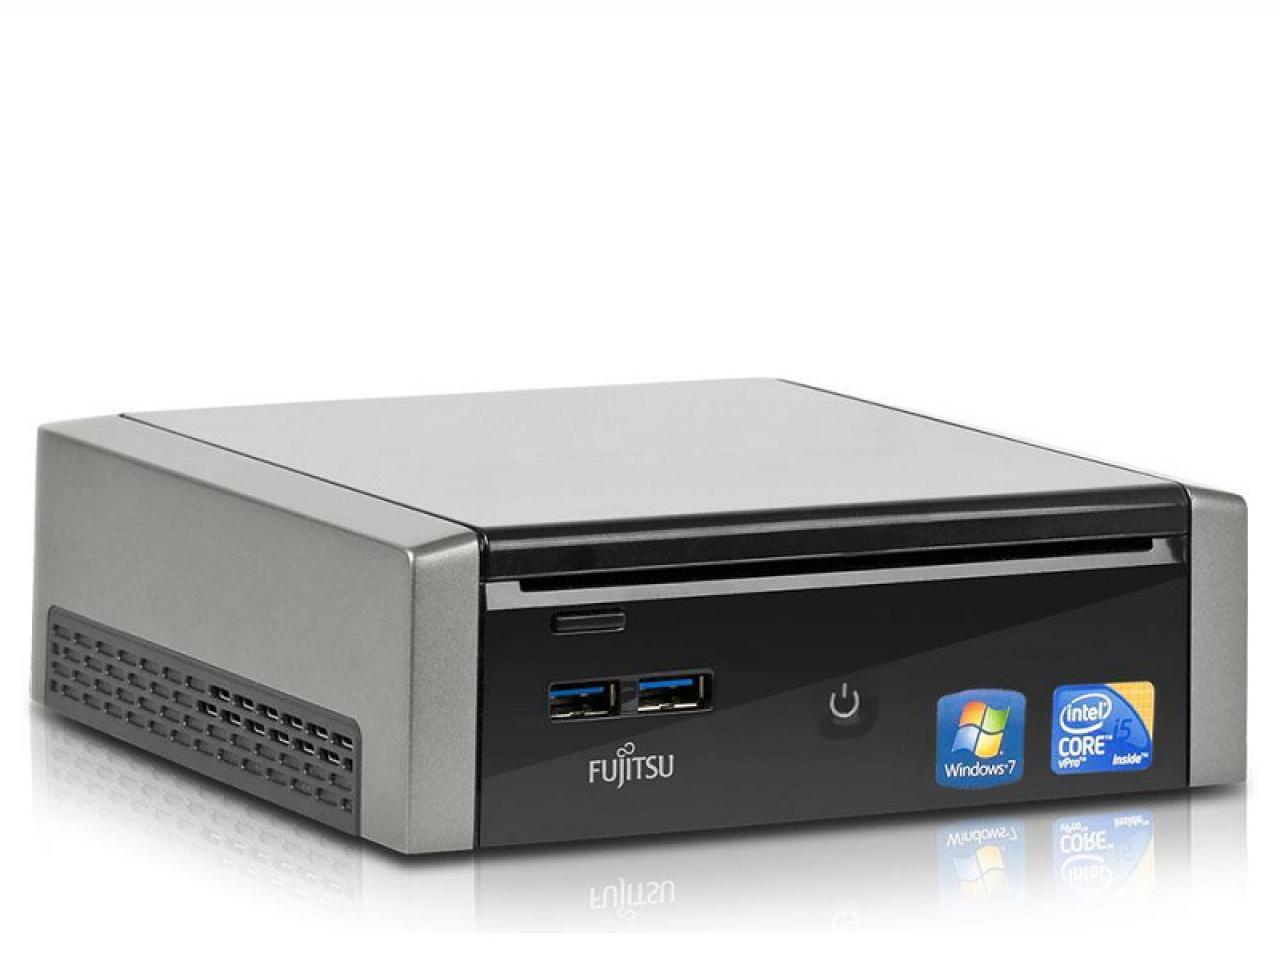 Fujitsu Q900 USFF  - shop.bb-net.de